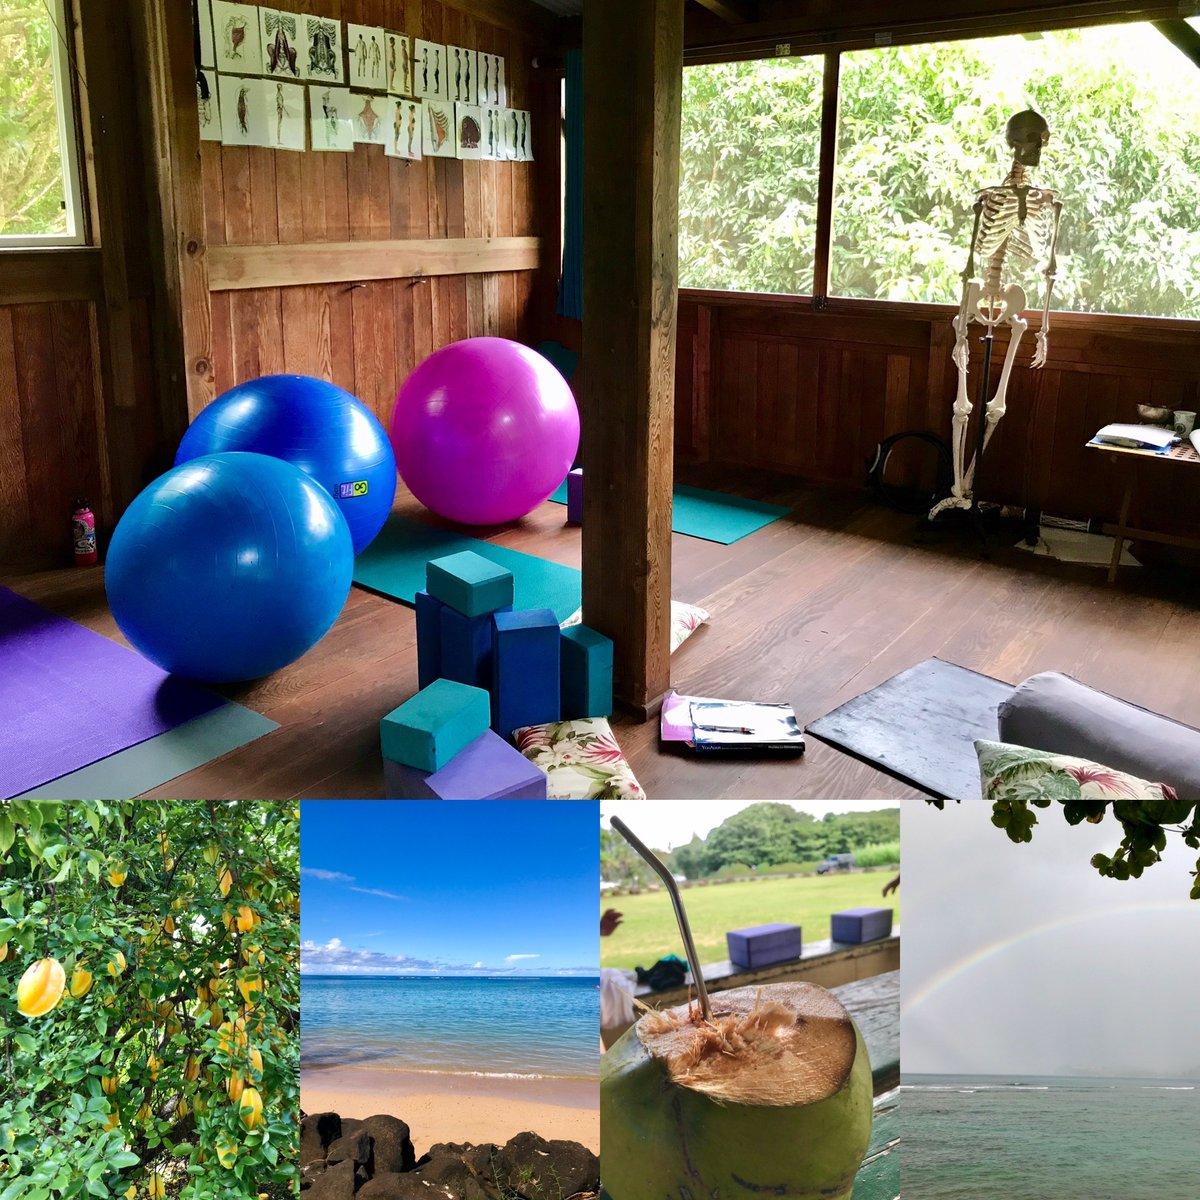 Day three of this goodness. #starfruit #yogalign #liquidlife ✌️❤️🌈 #innerbreathyoga #kauai #rainbows #movement #health #fitness #fun #happy #love https://t.co/a0LOmwsG86